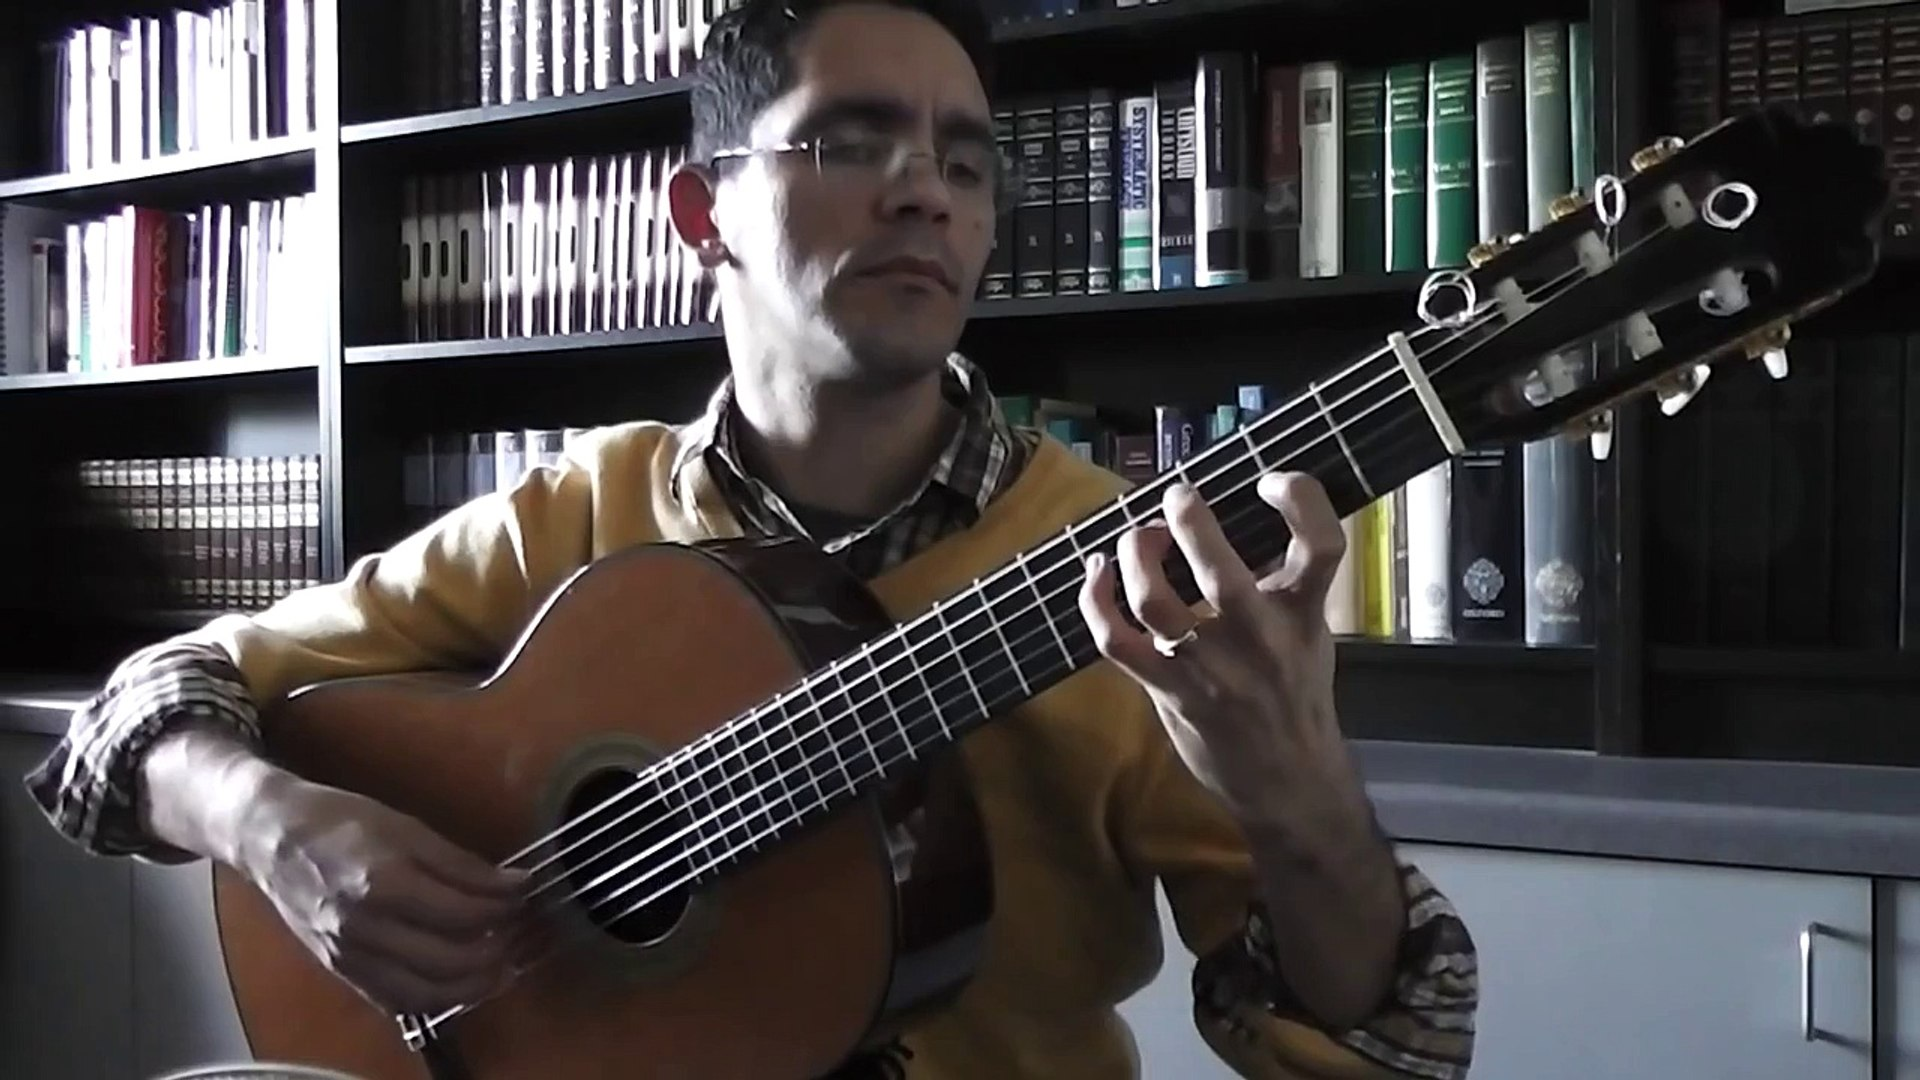 1992 Paulino Bernabe Classical Guitar 1992 Modelo 50 - Lament by Andrew York